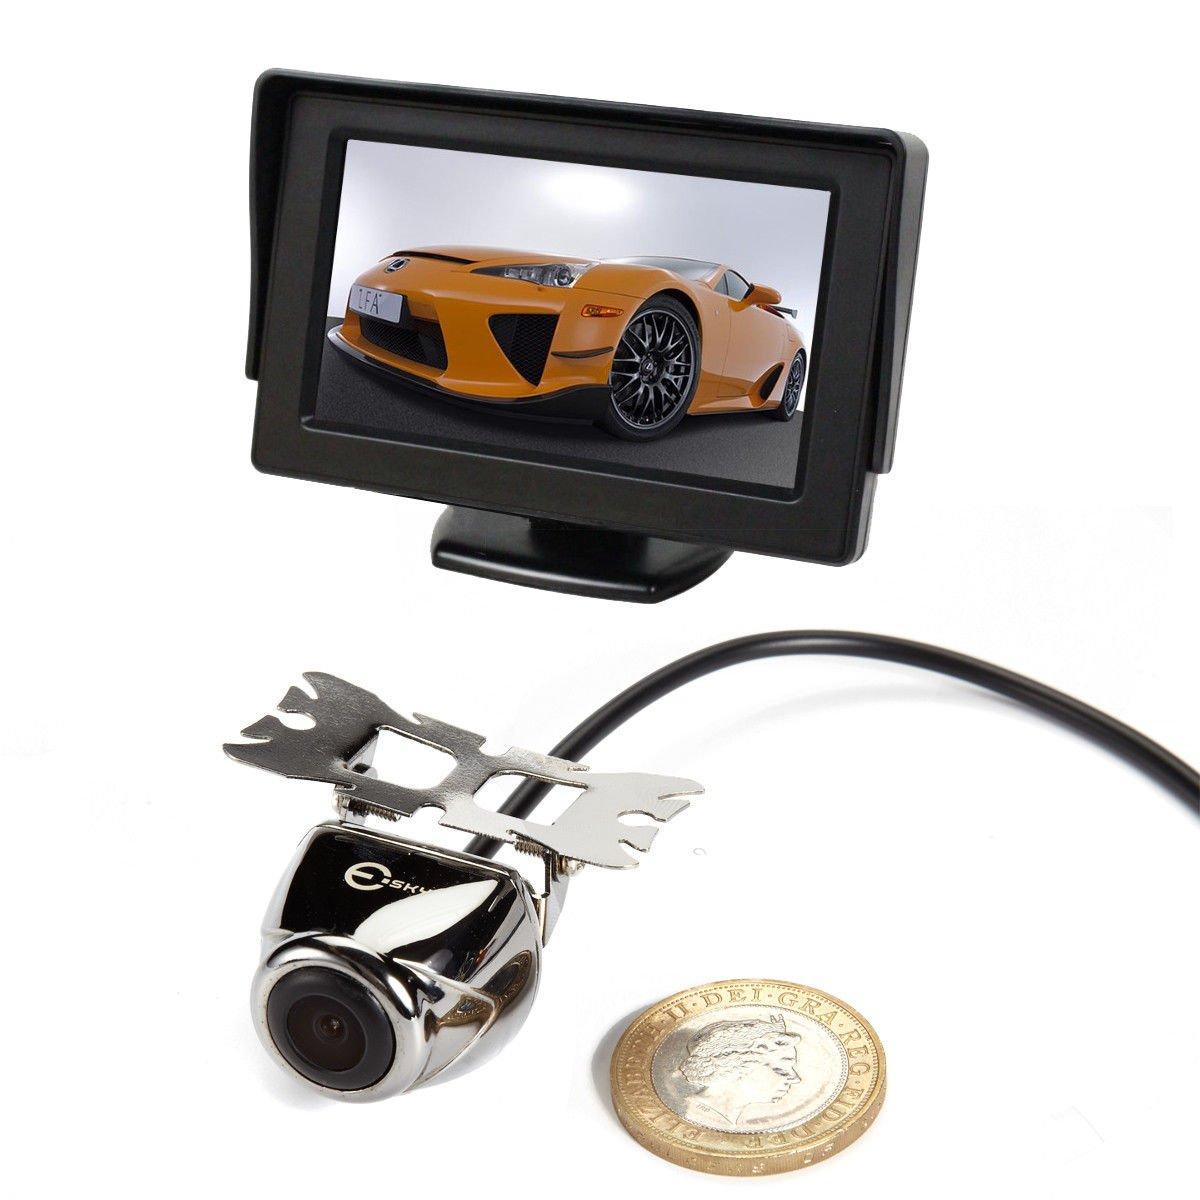 Universal Car RearView Backup Reverse Camera Night Vision 4.3 TFT LCD Monitor